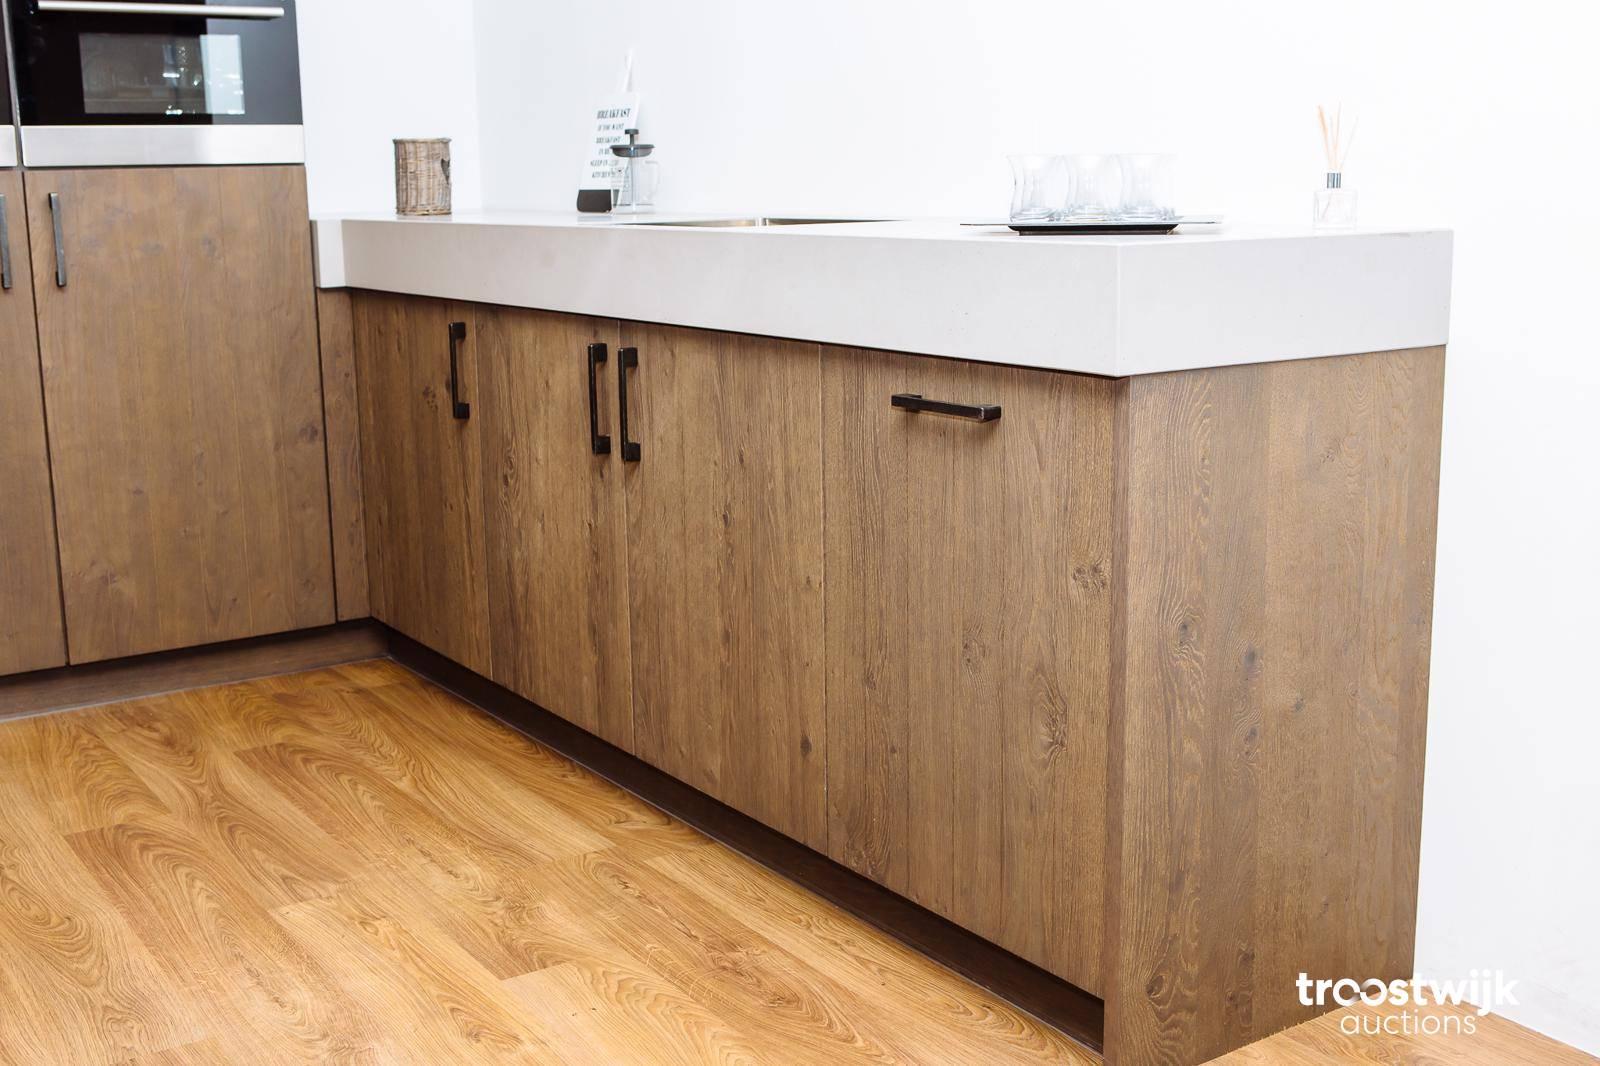 cucina moderna in legno rovere scuro con isola - Troostwijk